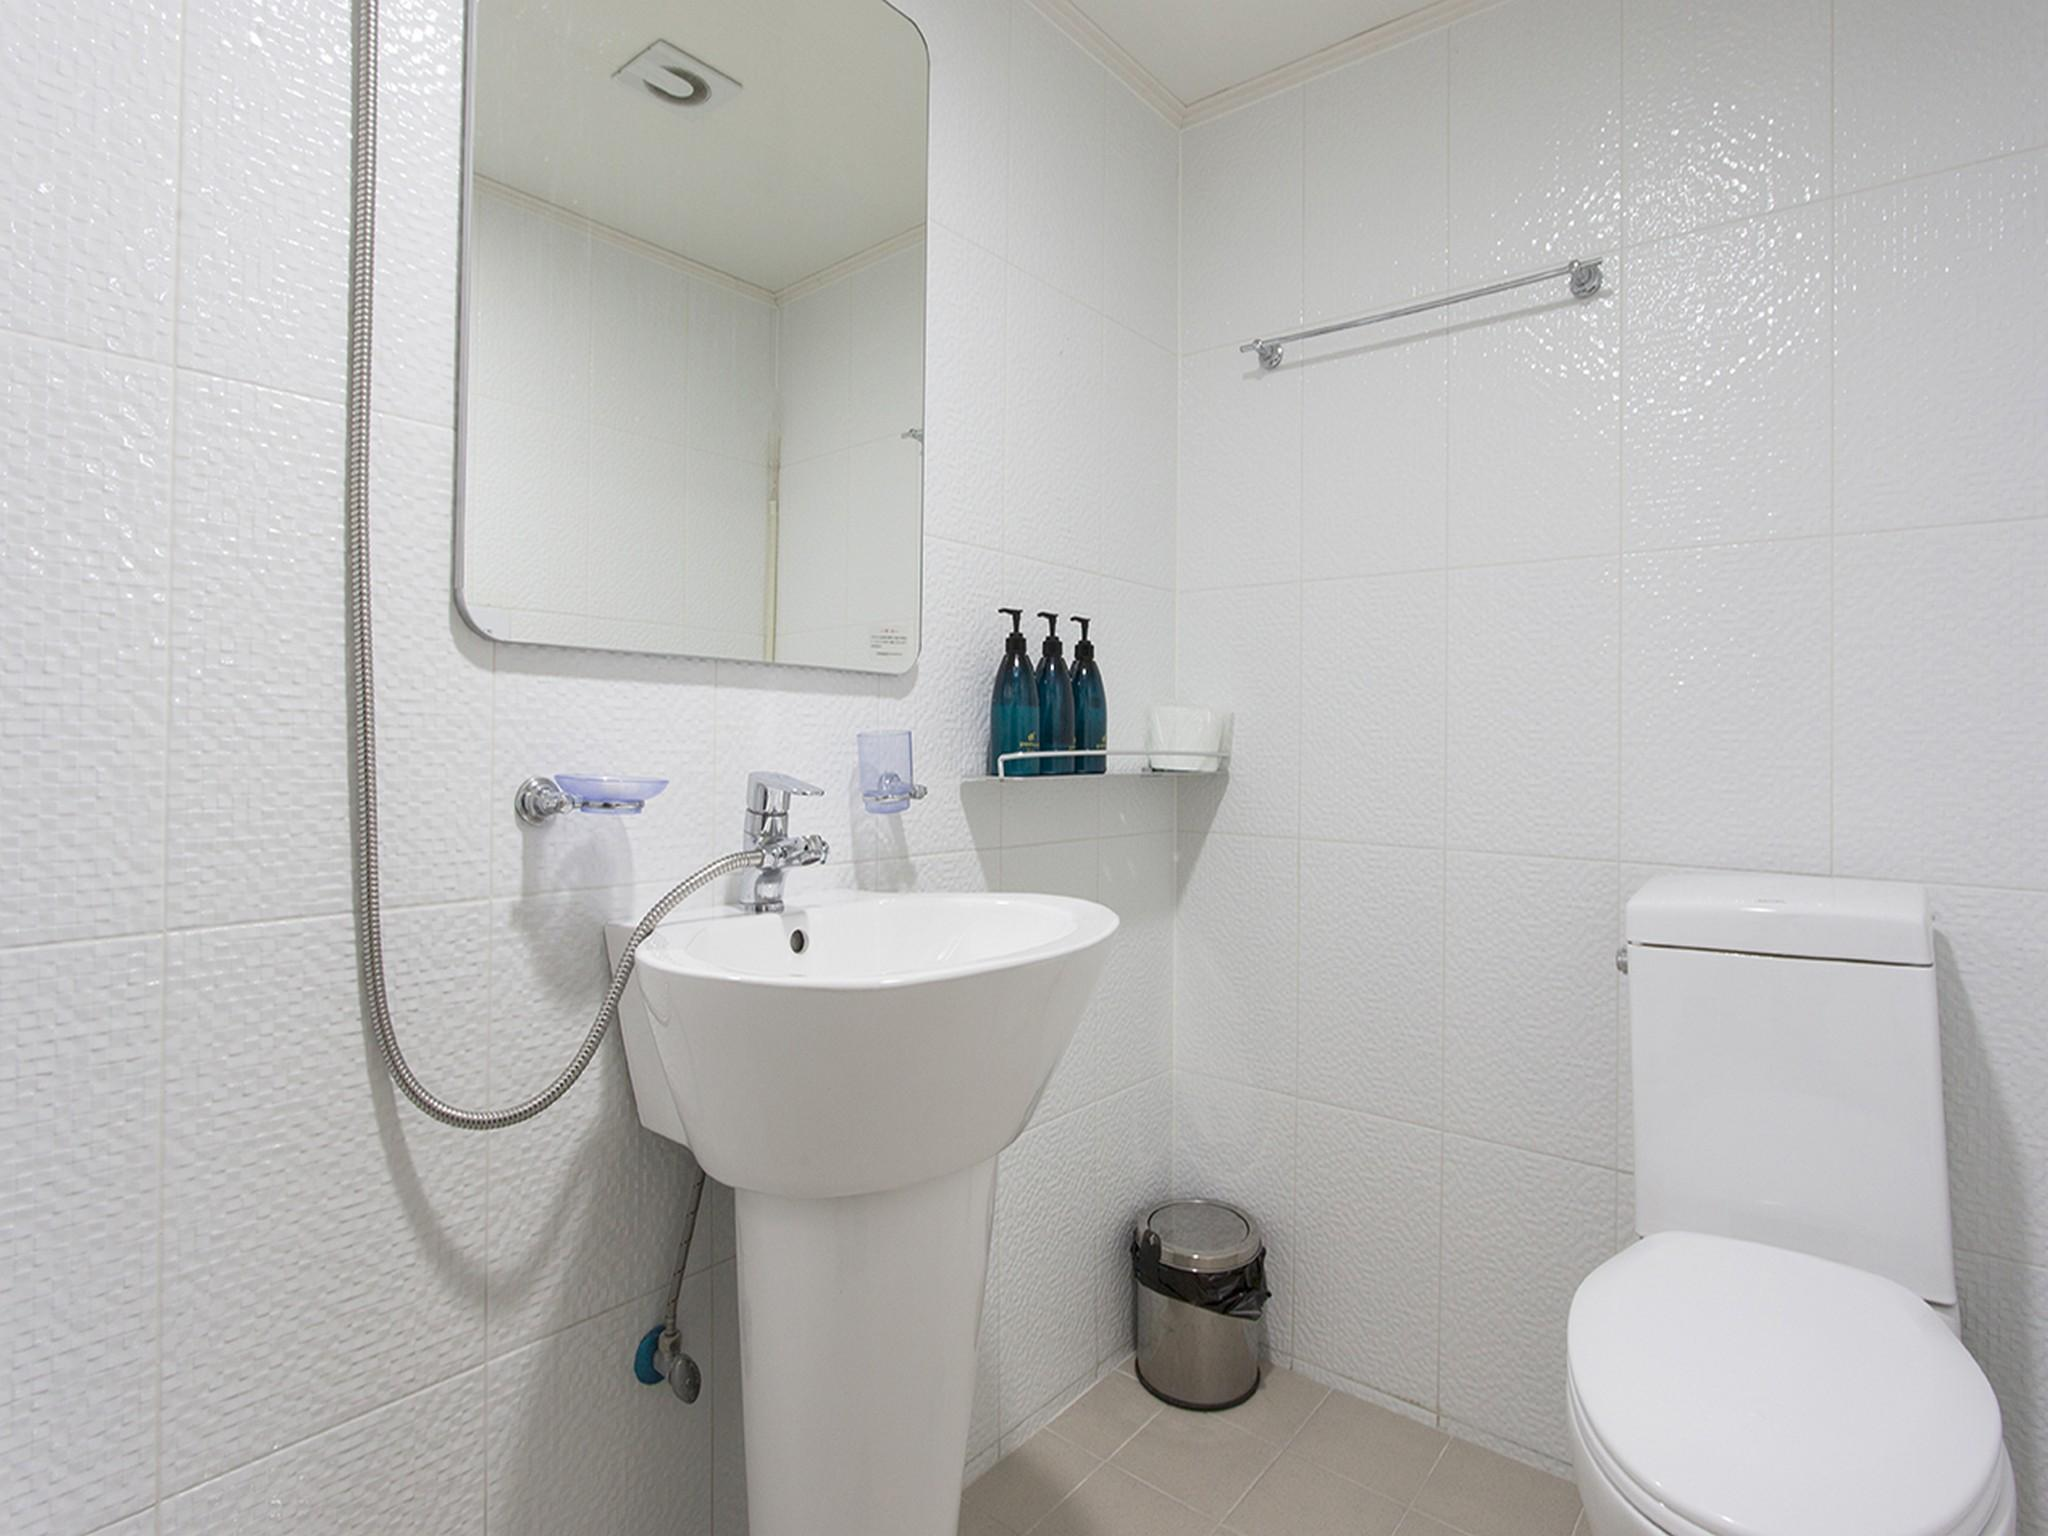 Itaewon washroom